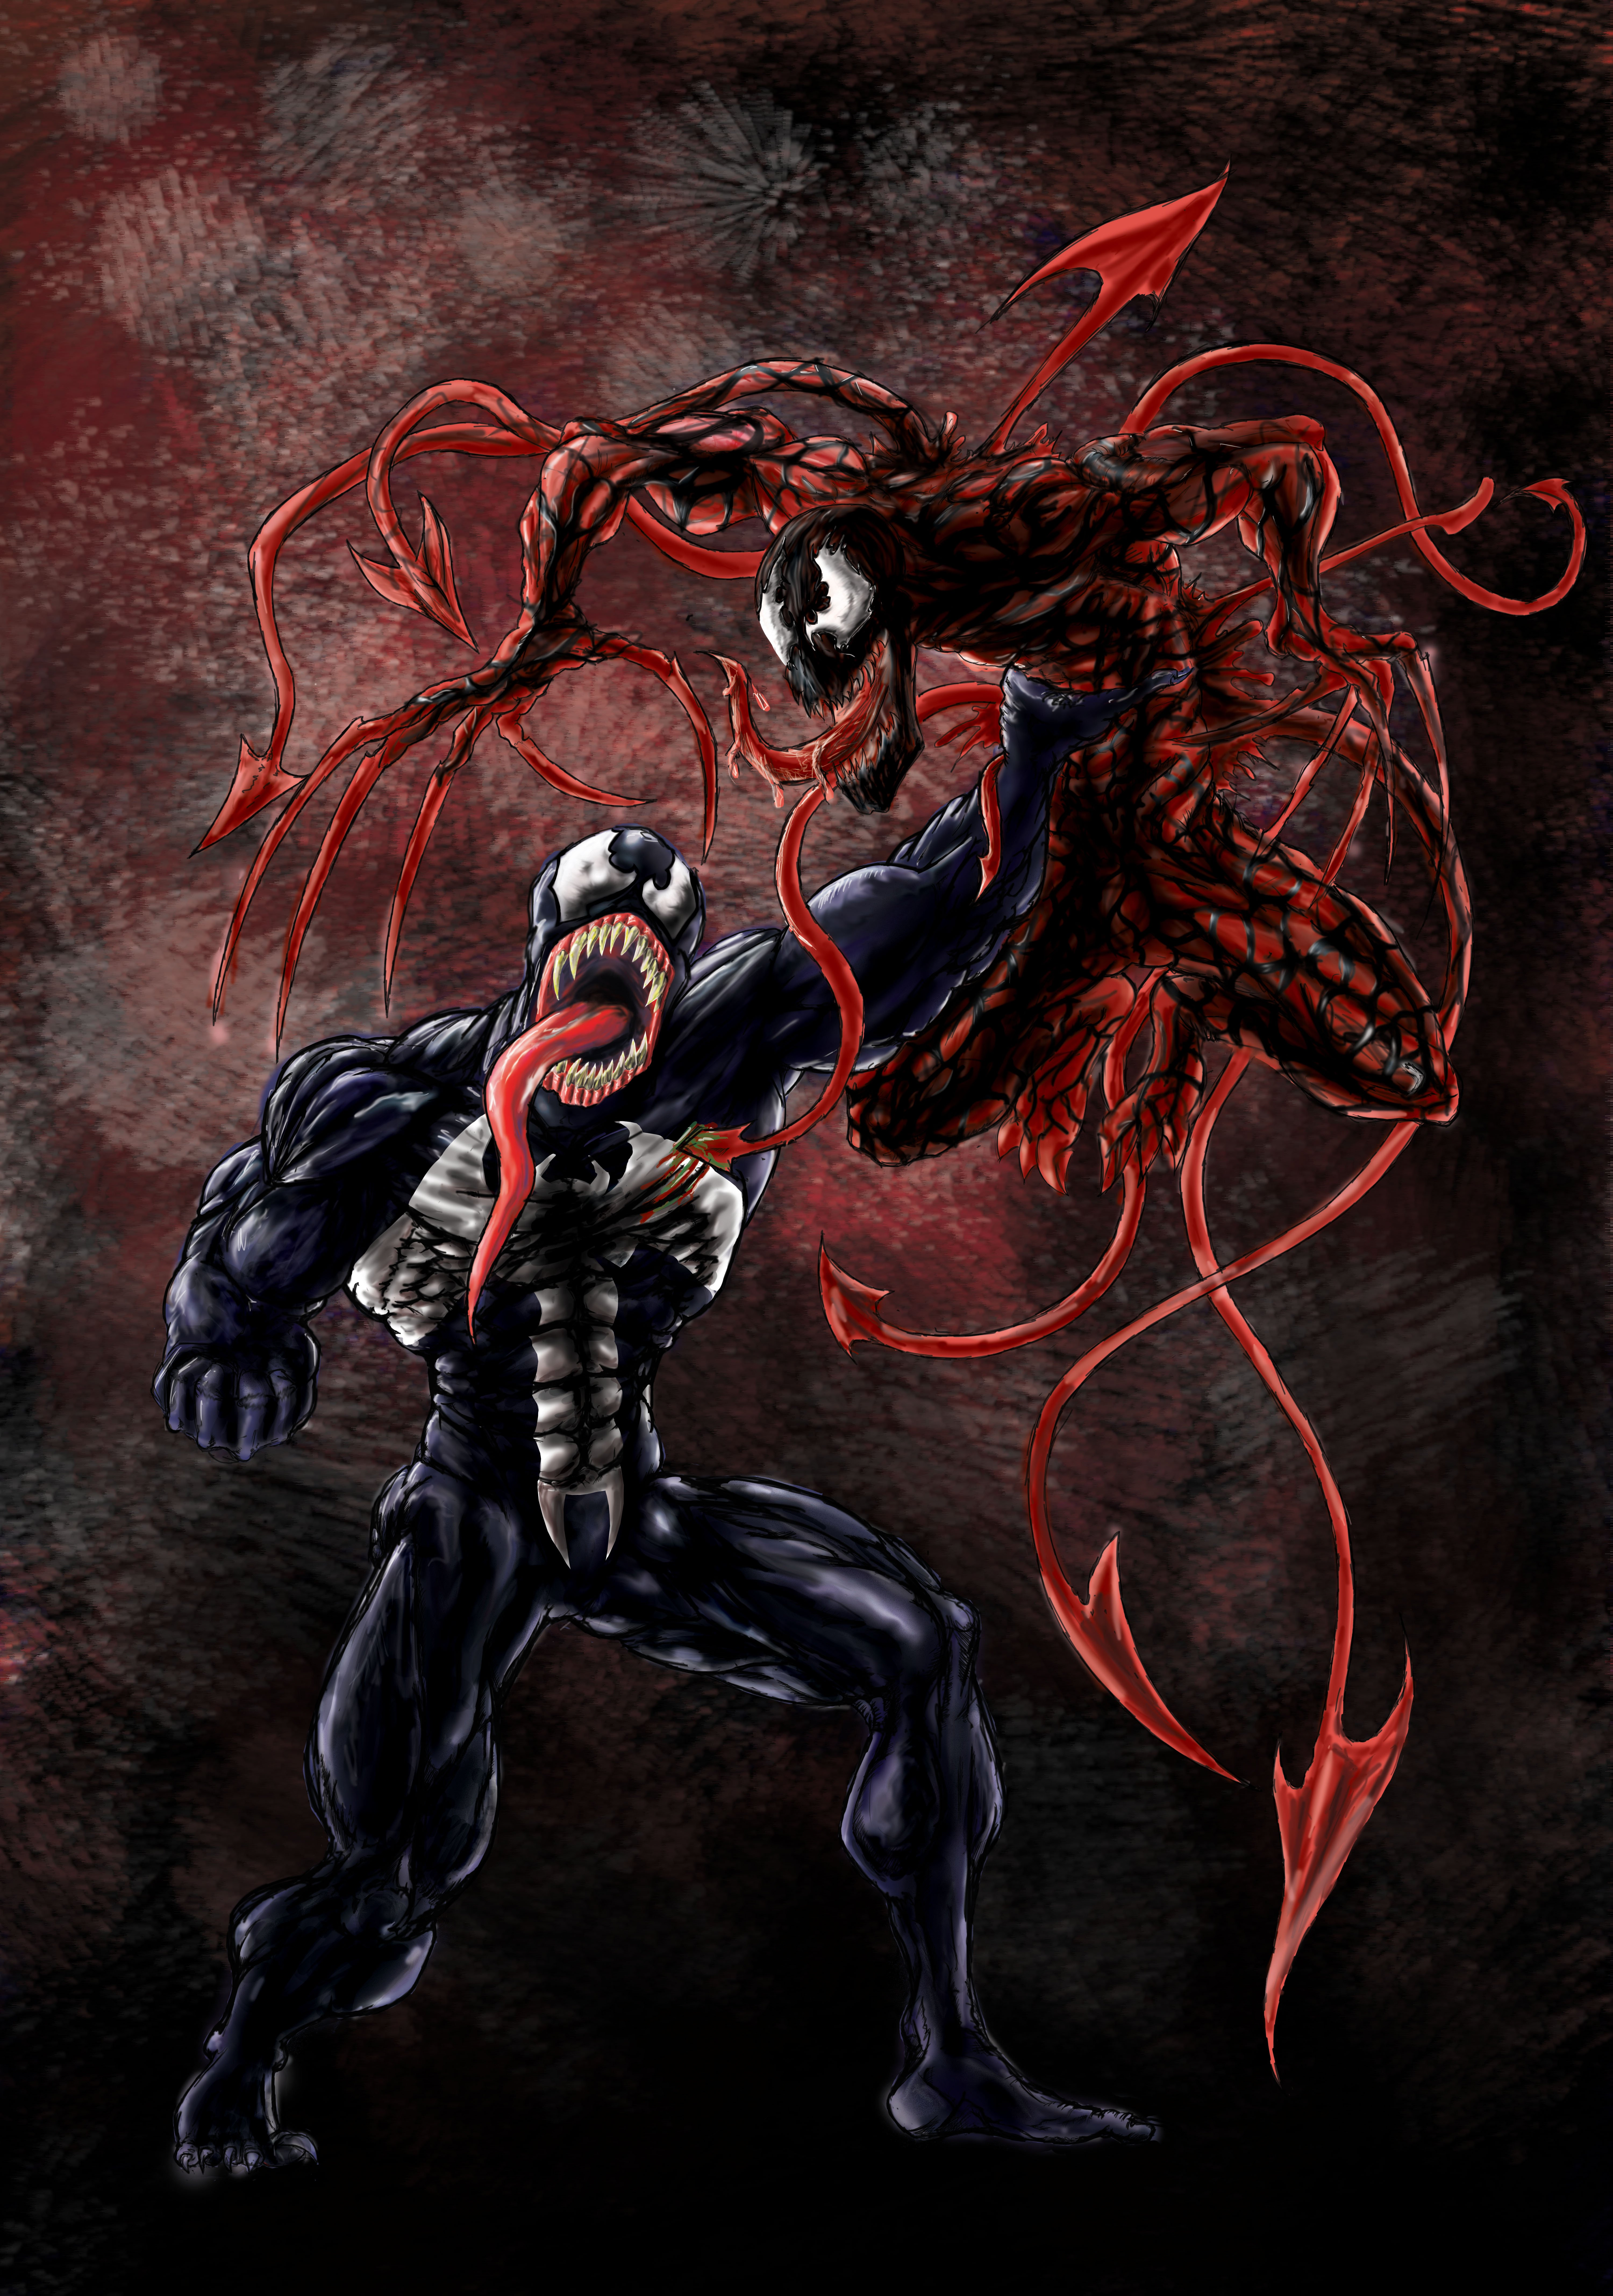 Carnage venom